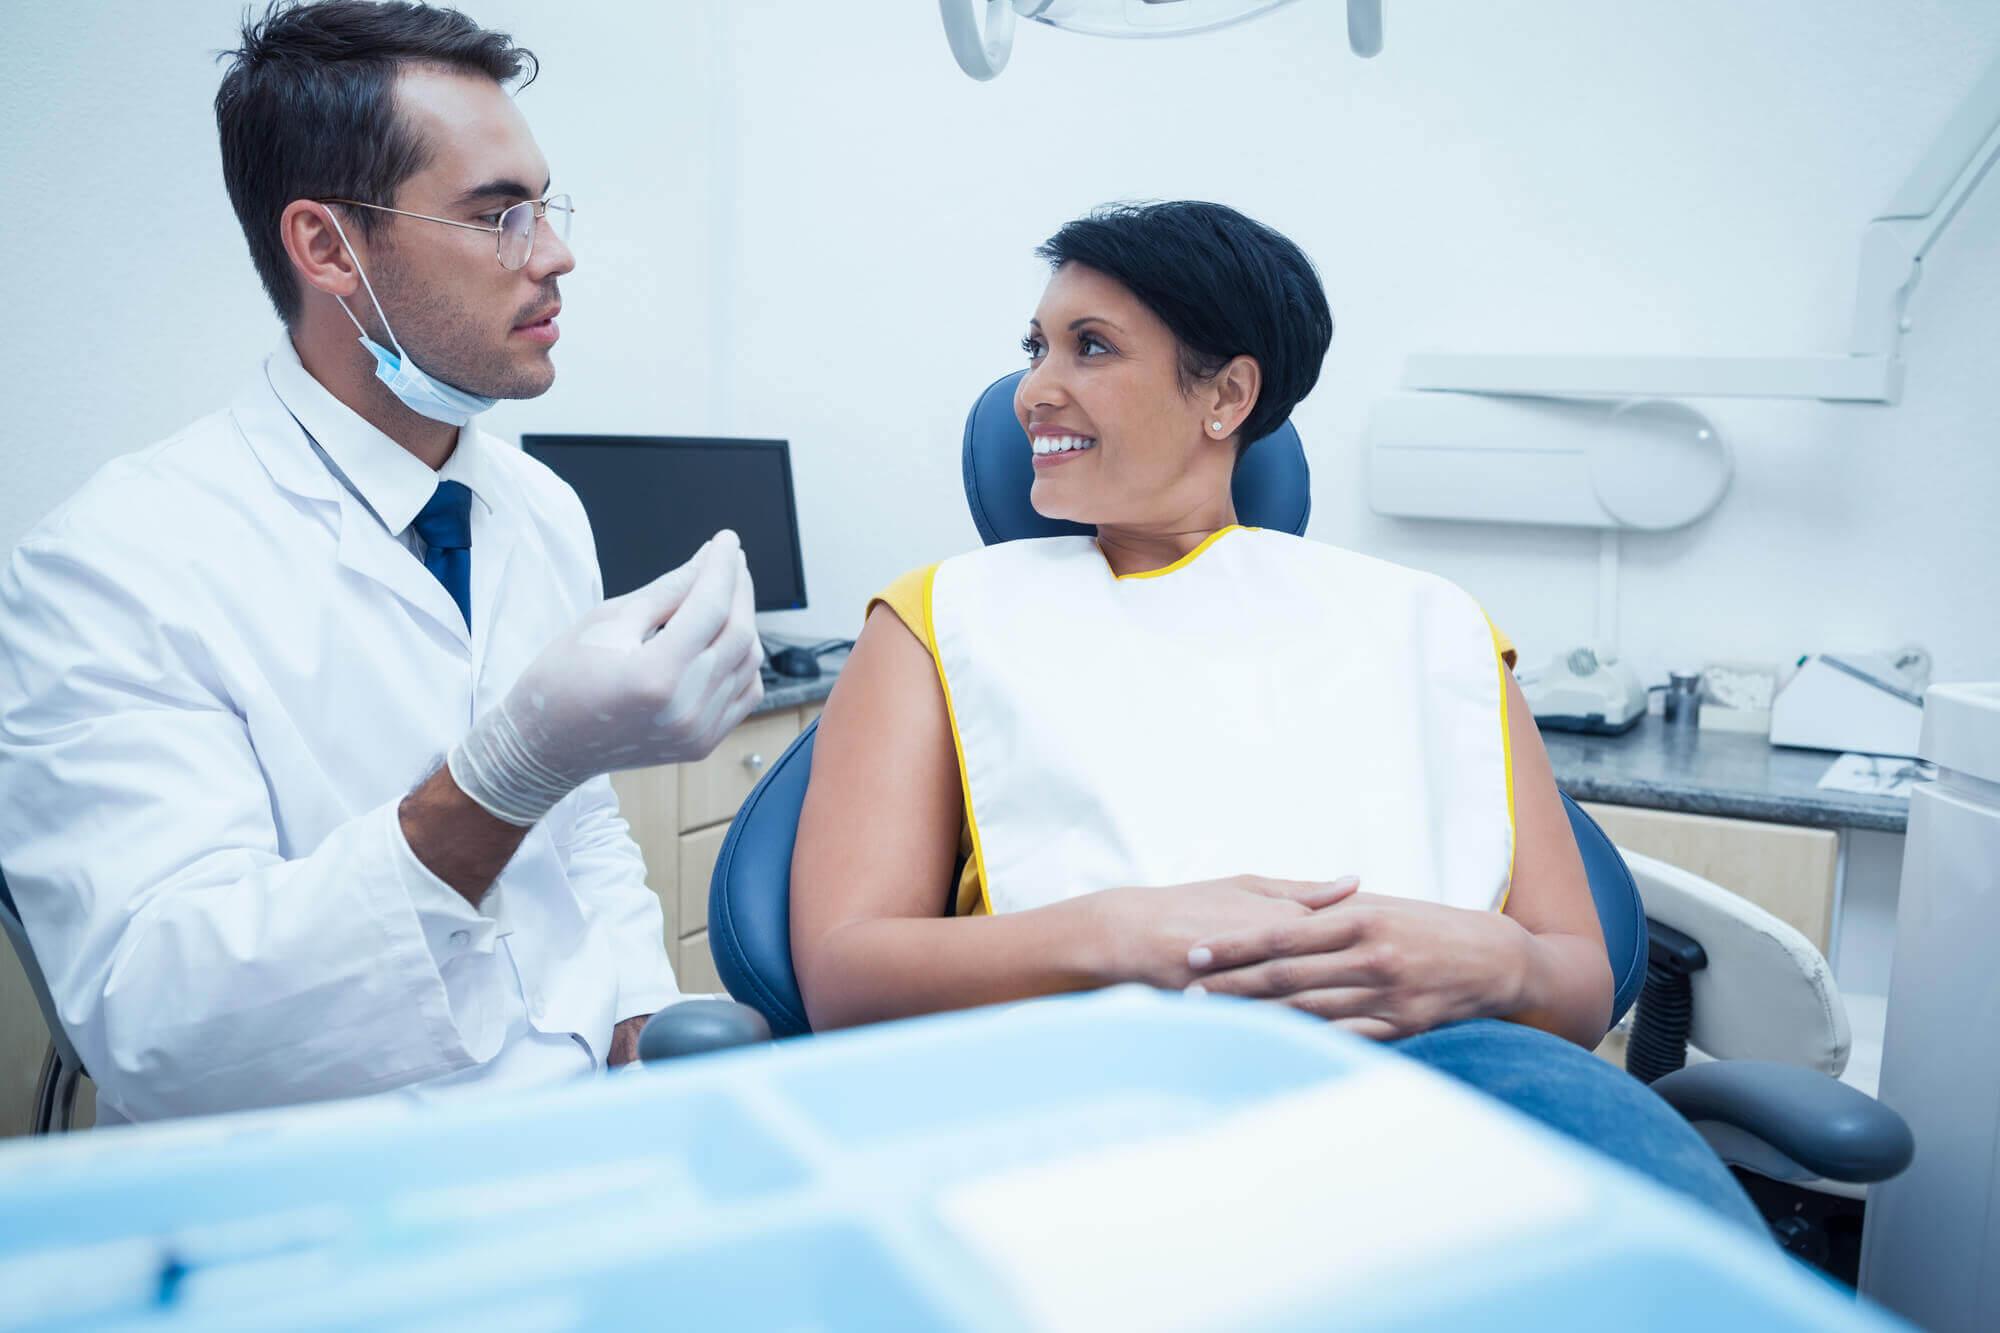 Male Dentist Examining Womans Teeth